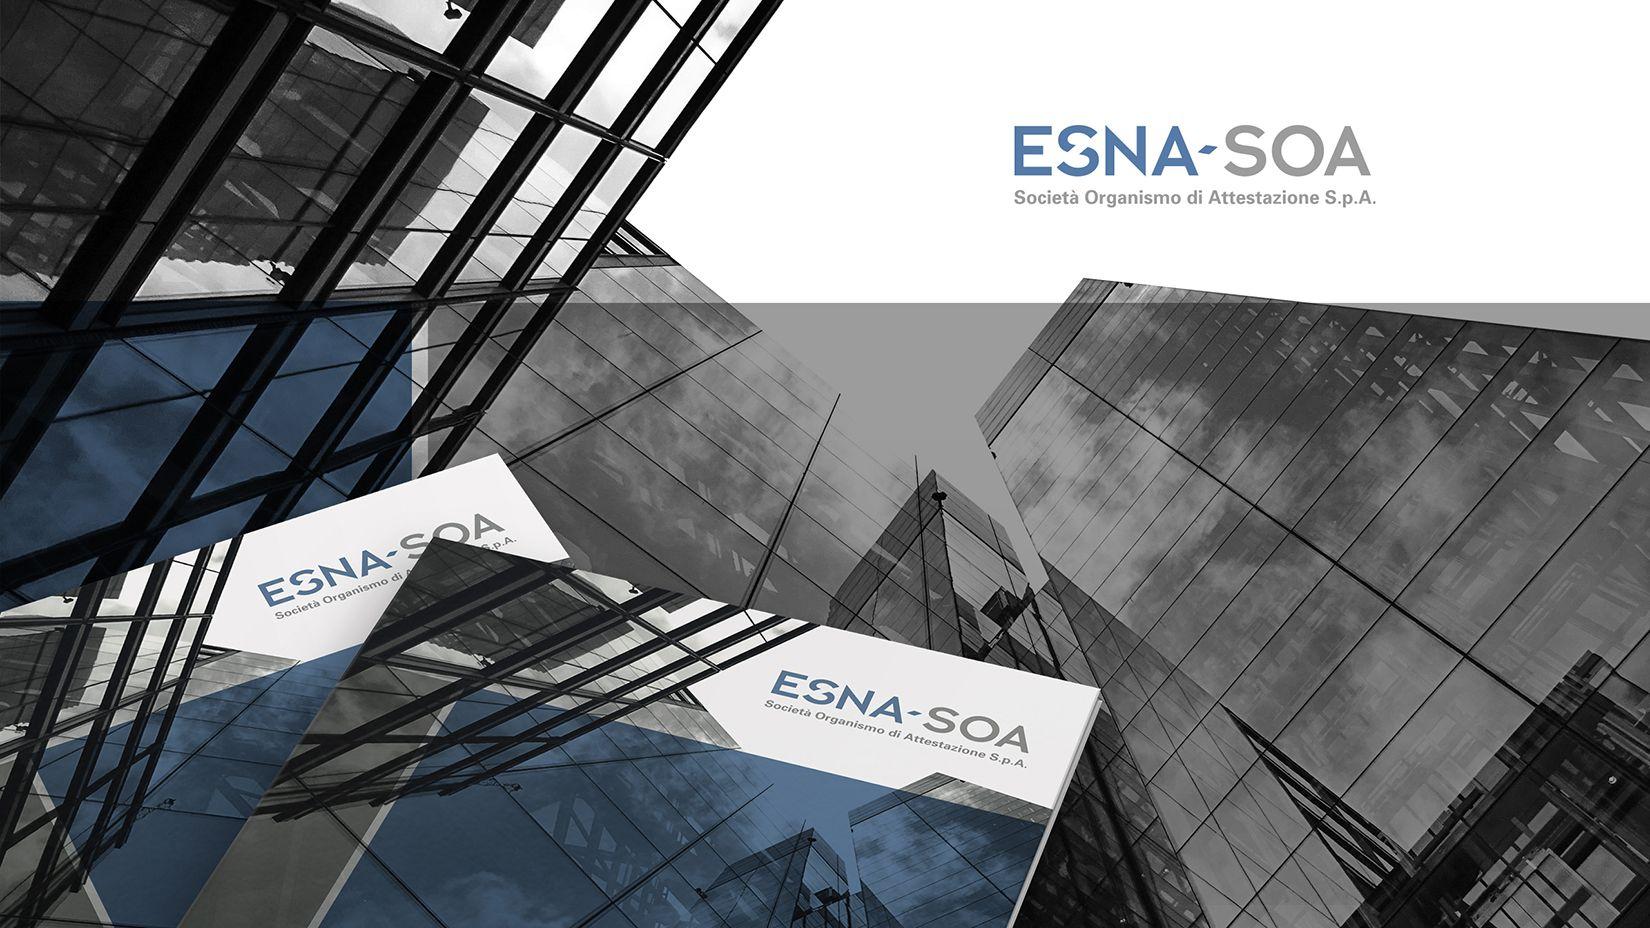 Grafica Pubblicitaria Immagine Coordinata ESNA-SOA 1